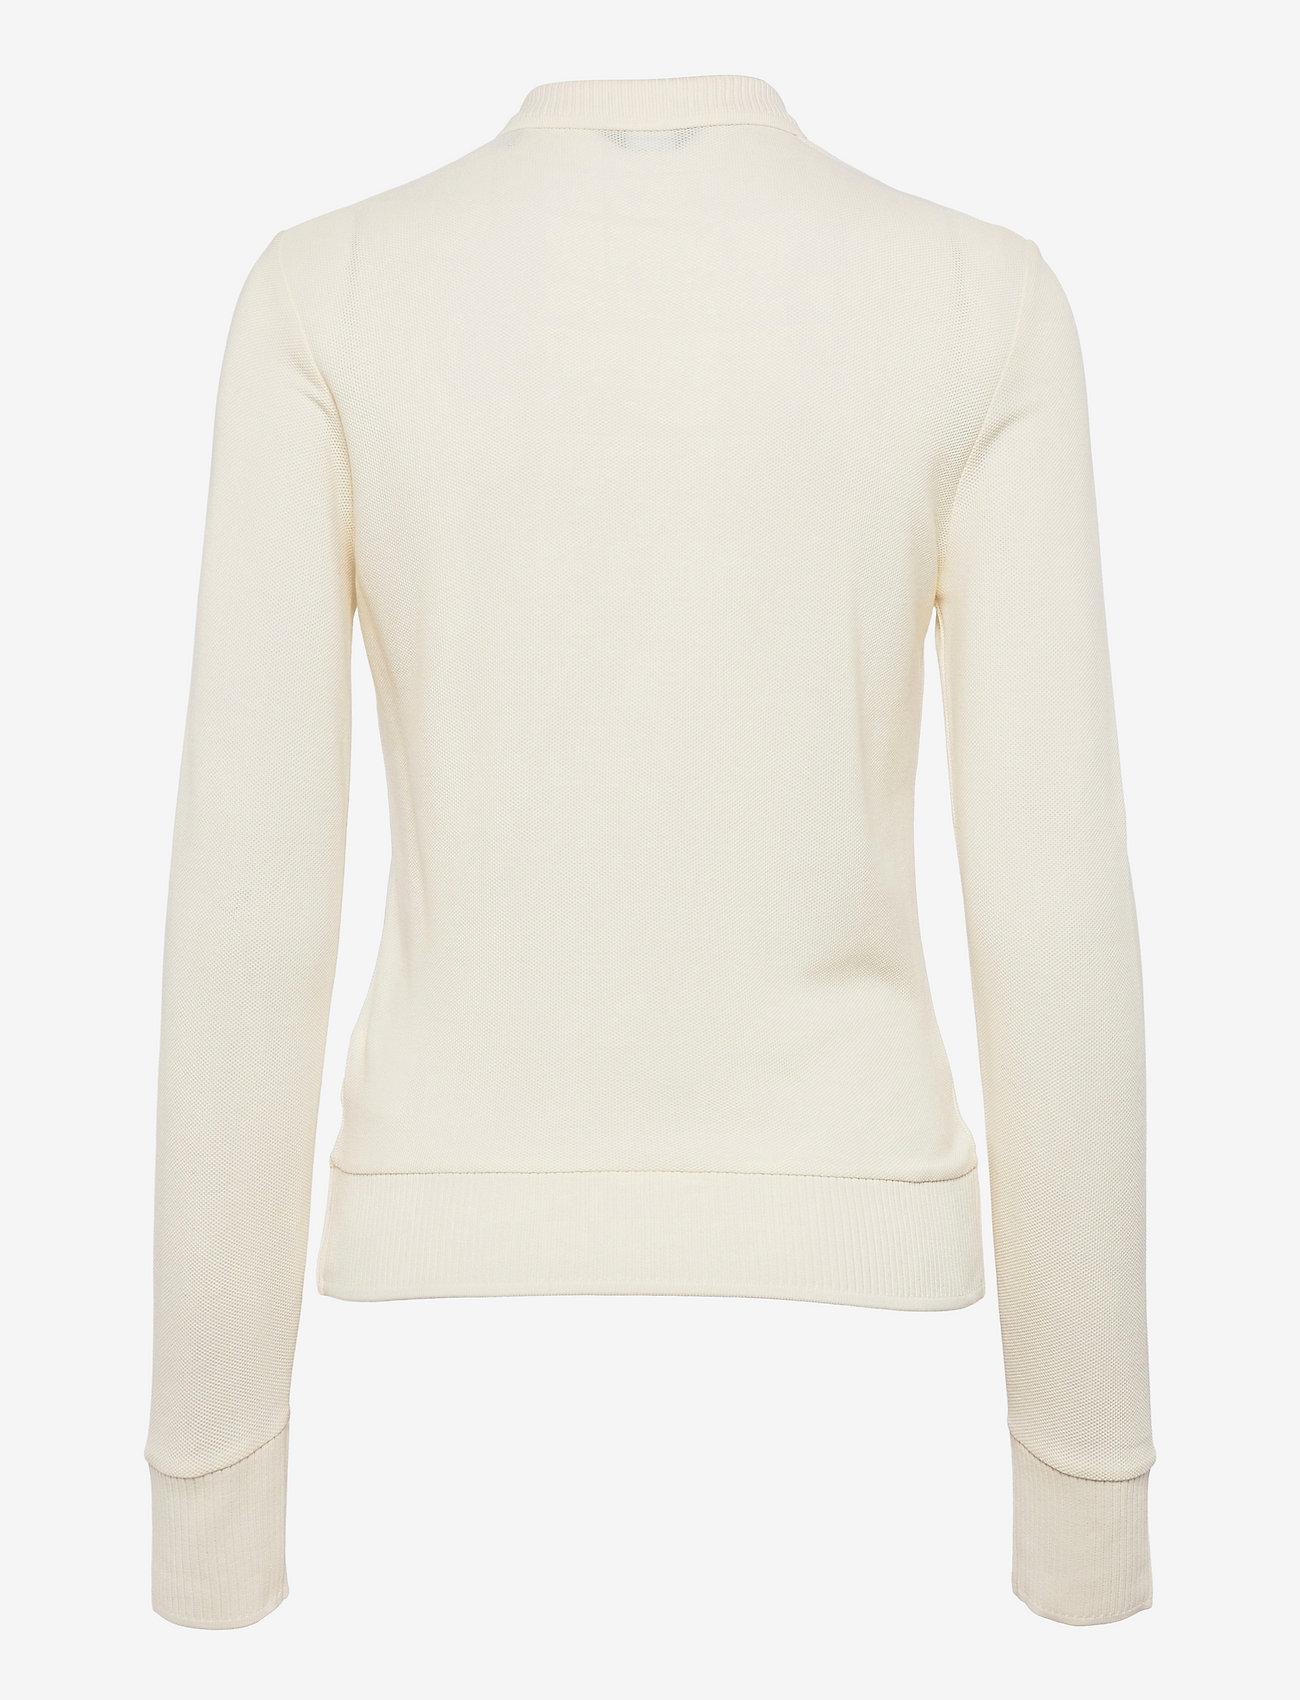 GANT - D1. CROWN EMBROIDERY POLO PIQUE - t-shirt & tops - cream - 1